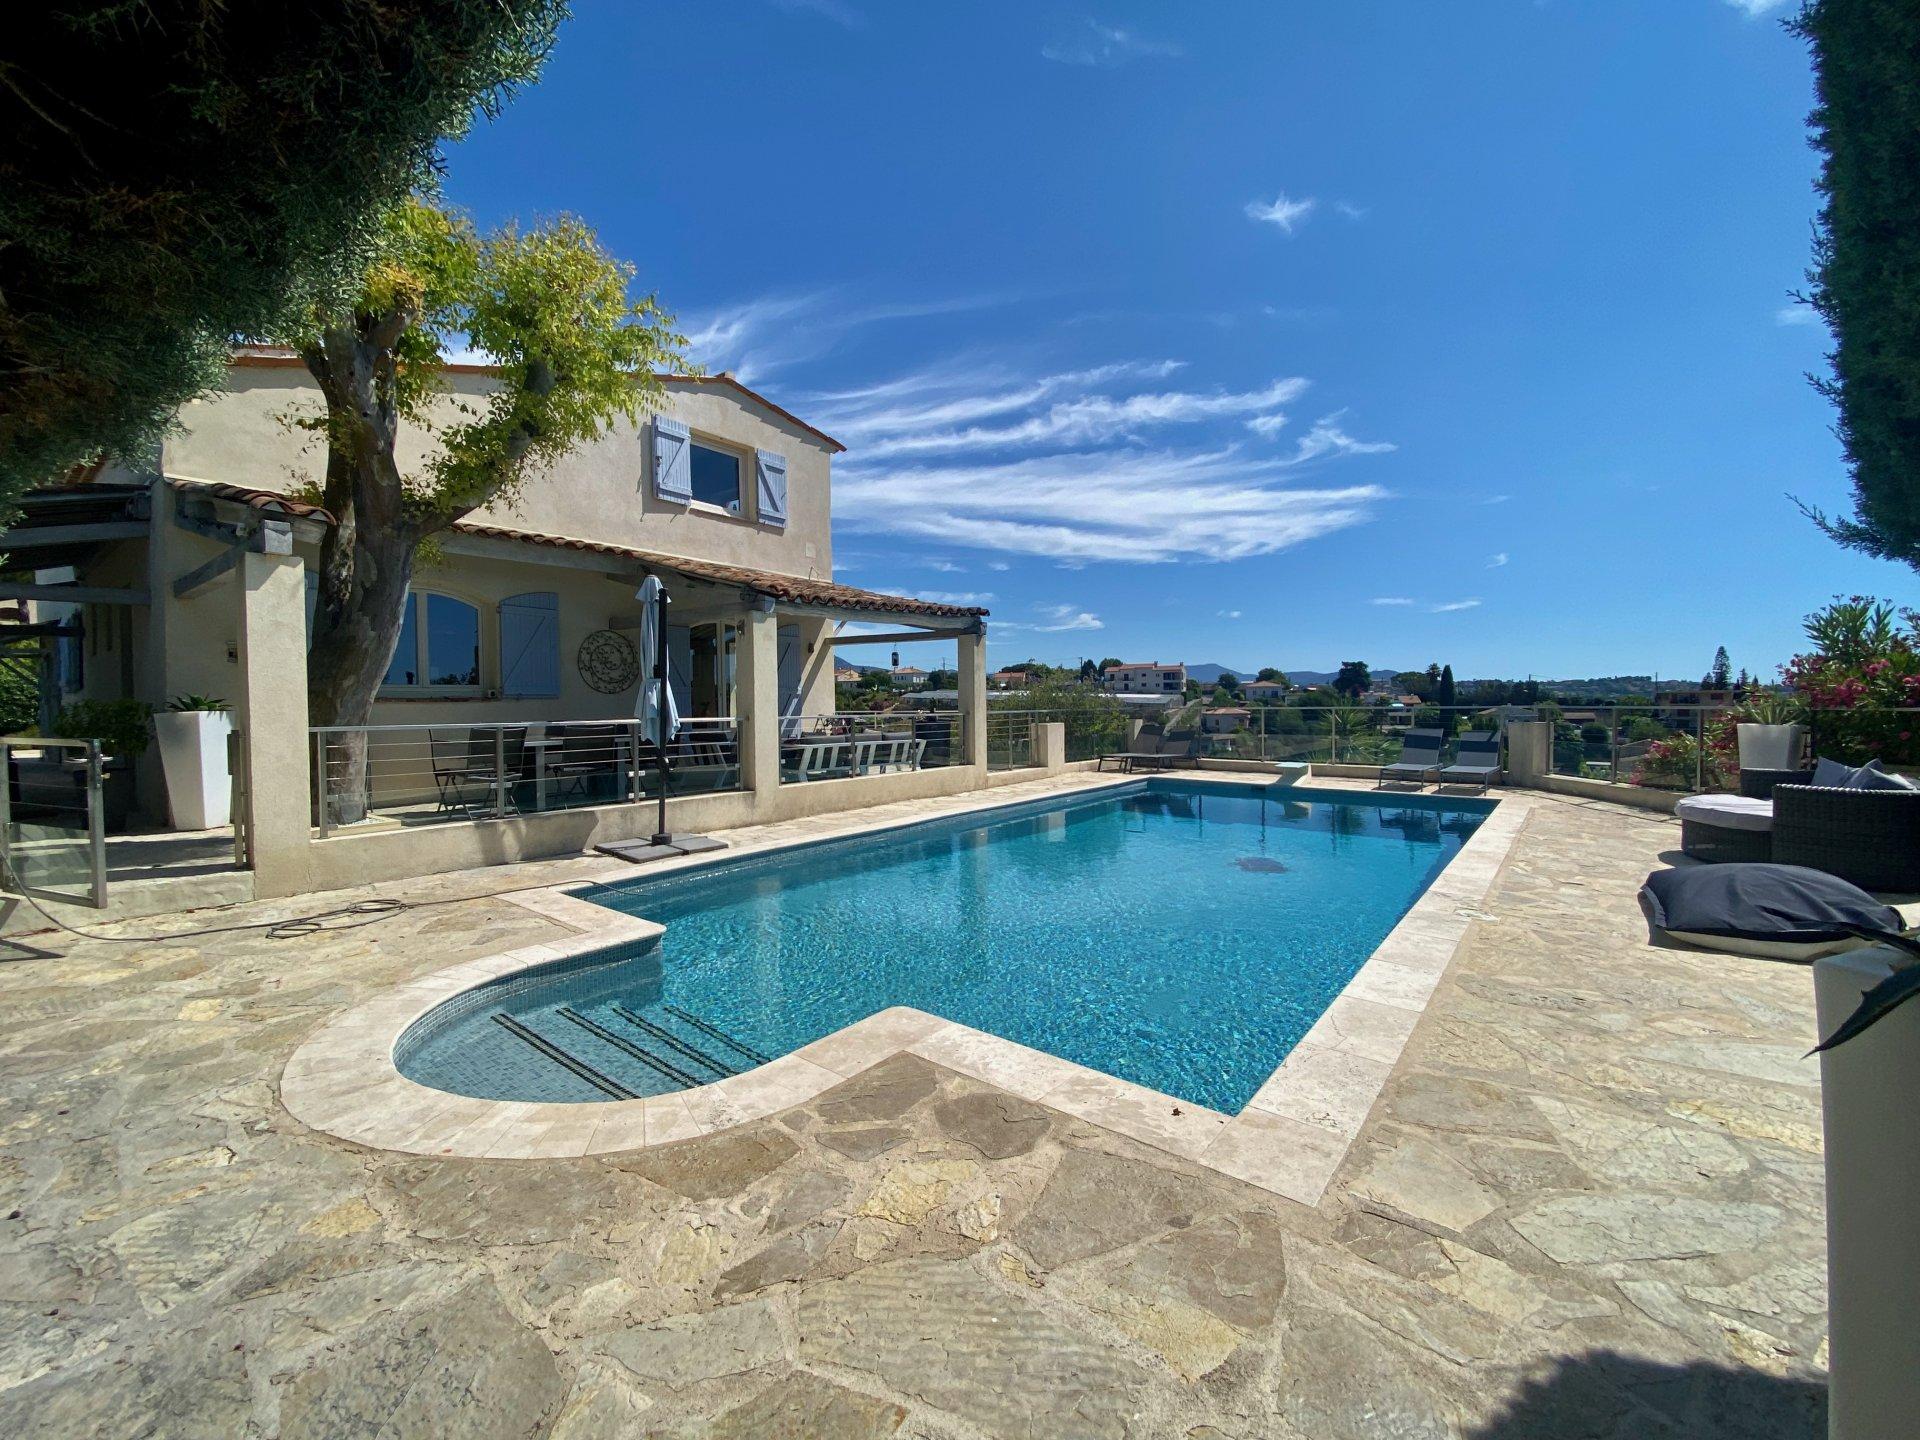 Saint Laurent du Var: Neo Provencal house with swimming pool.